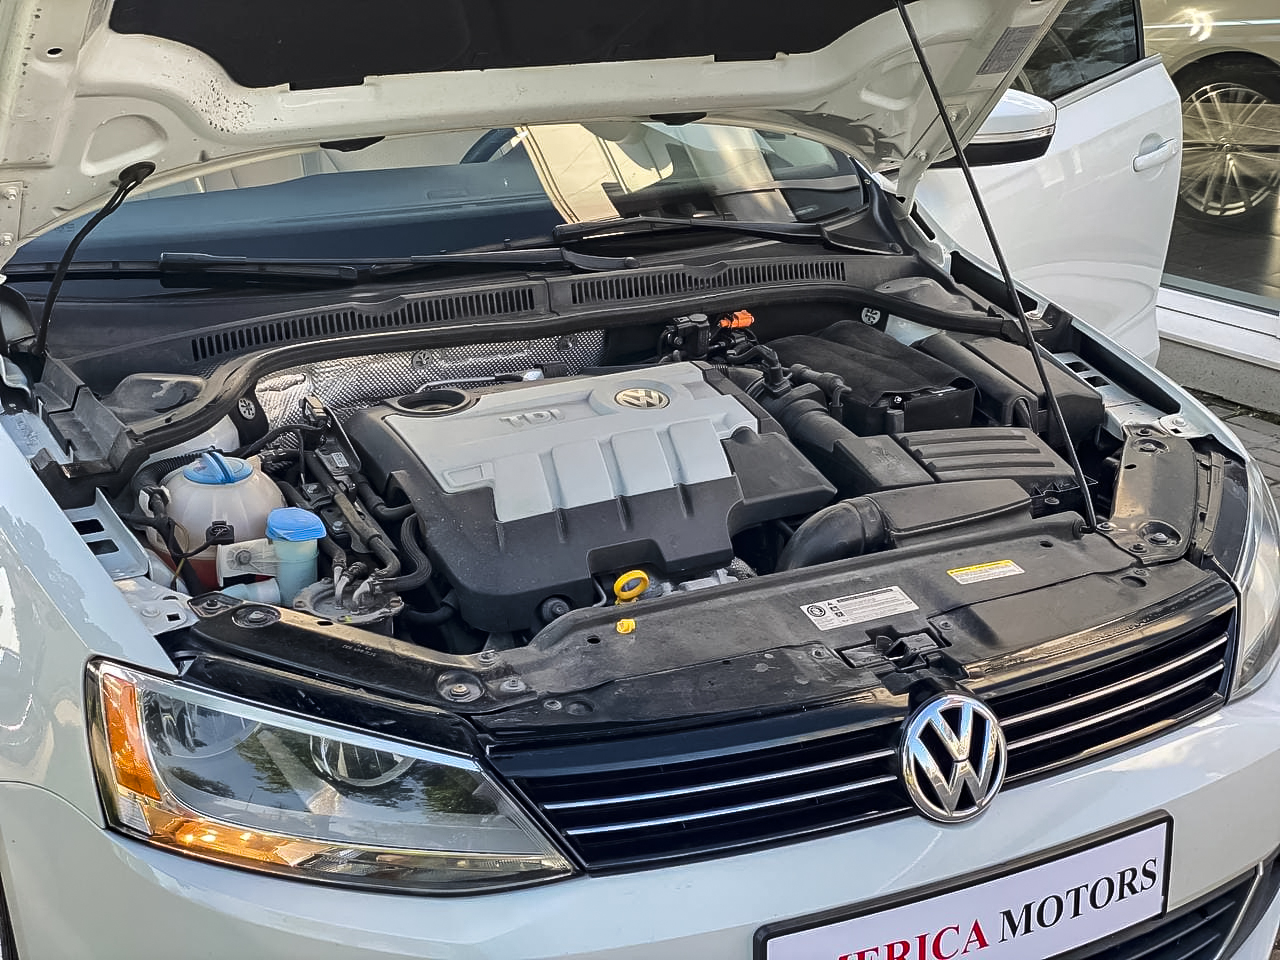 2014 Volkswagen JETTA   Vin: 3VWLL7AJ6EM411649